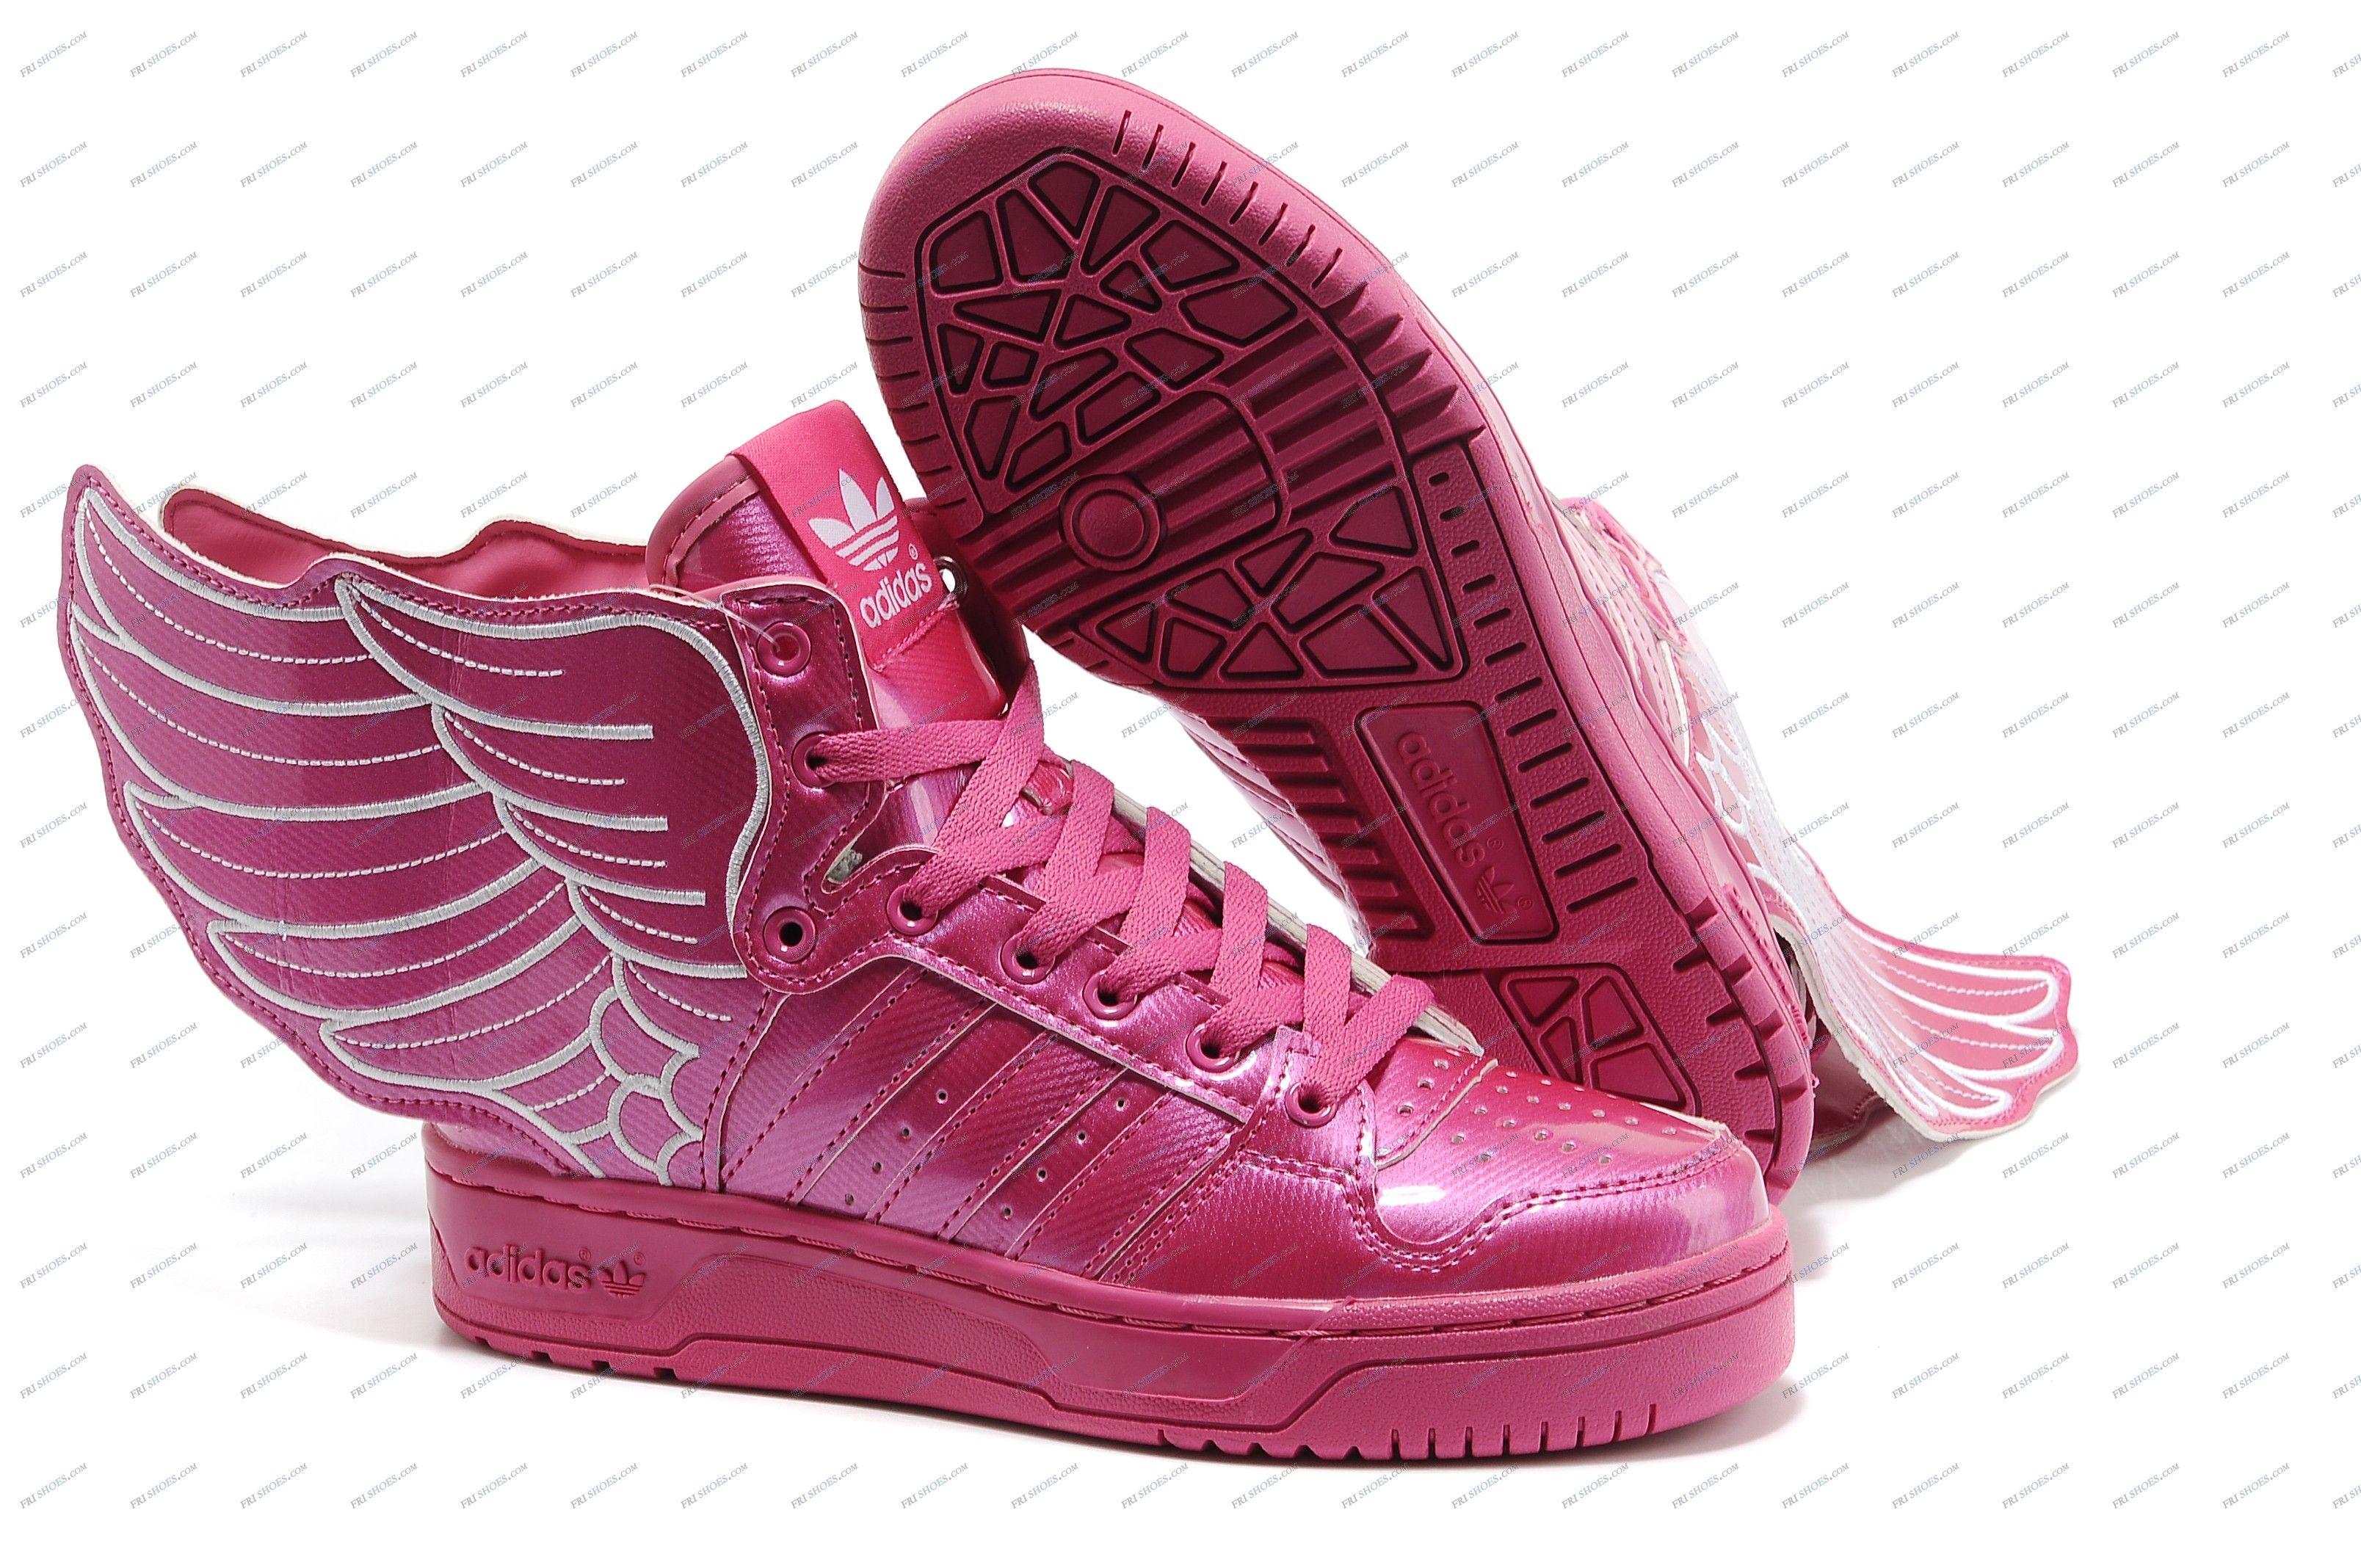 Adidas Originals Jeremy Scott x 2NE1 JS Wings Pink Women's Running Shoes  sports shoes online